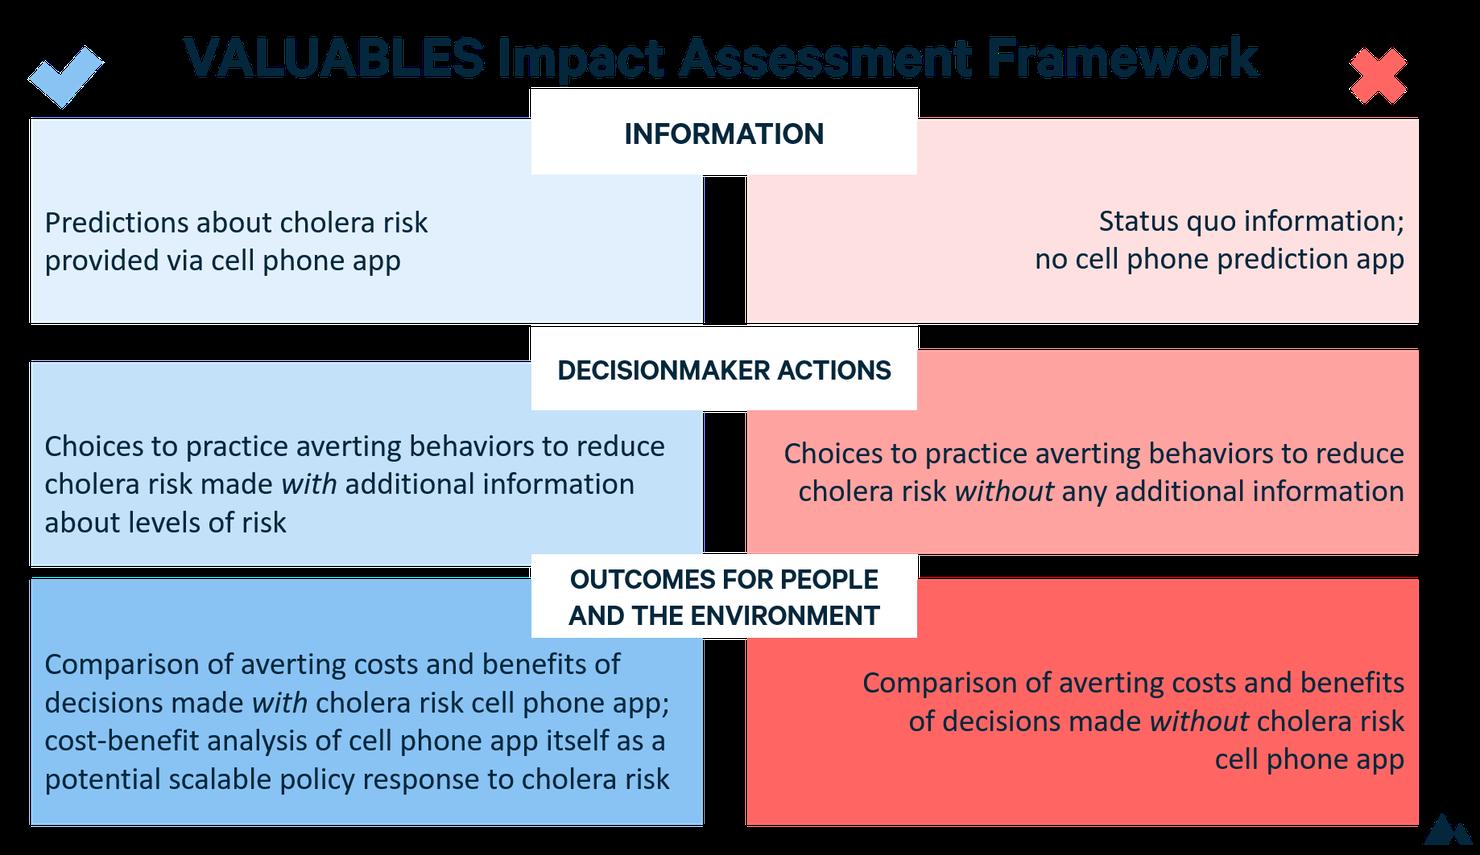 Sonia Aziz GABS impact assessment framework